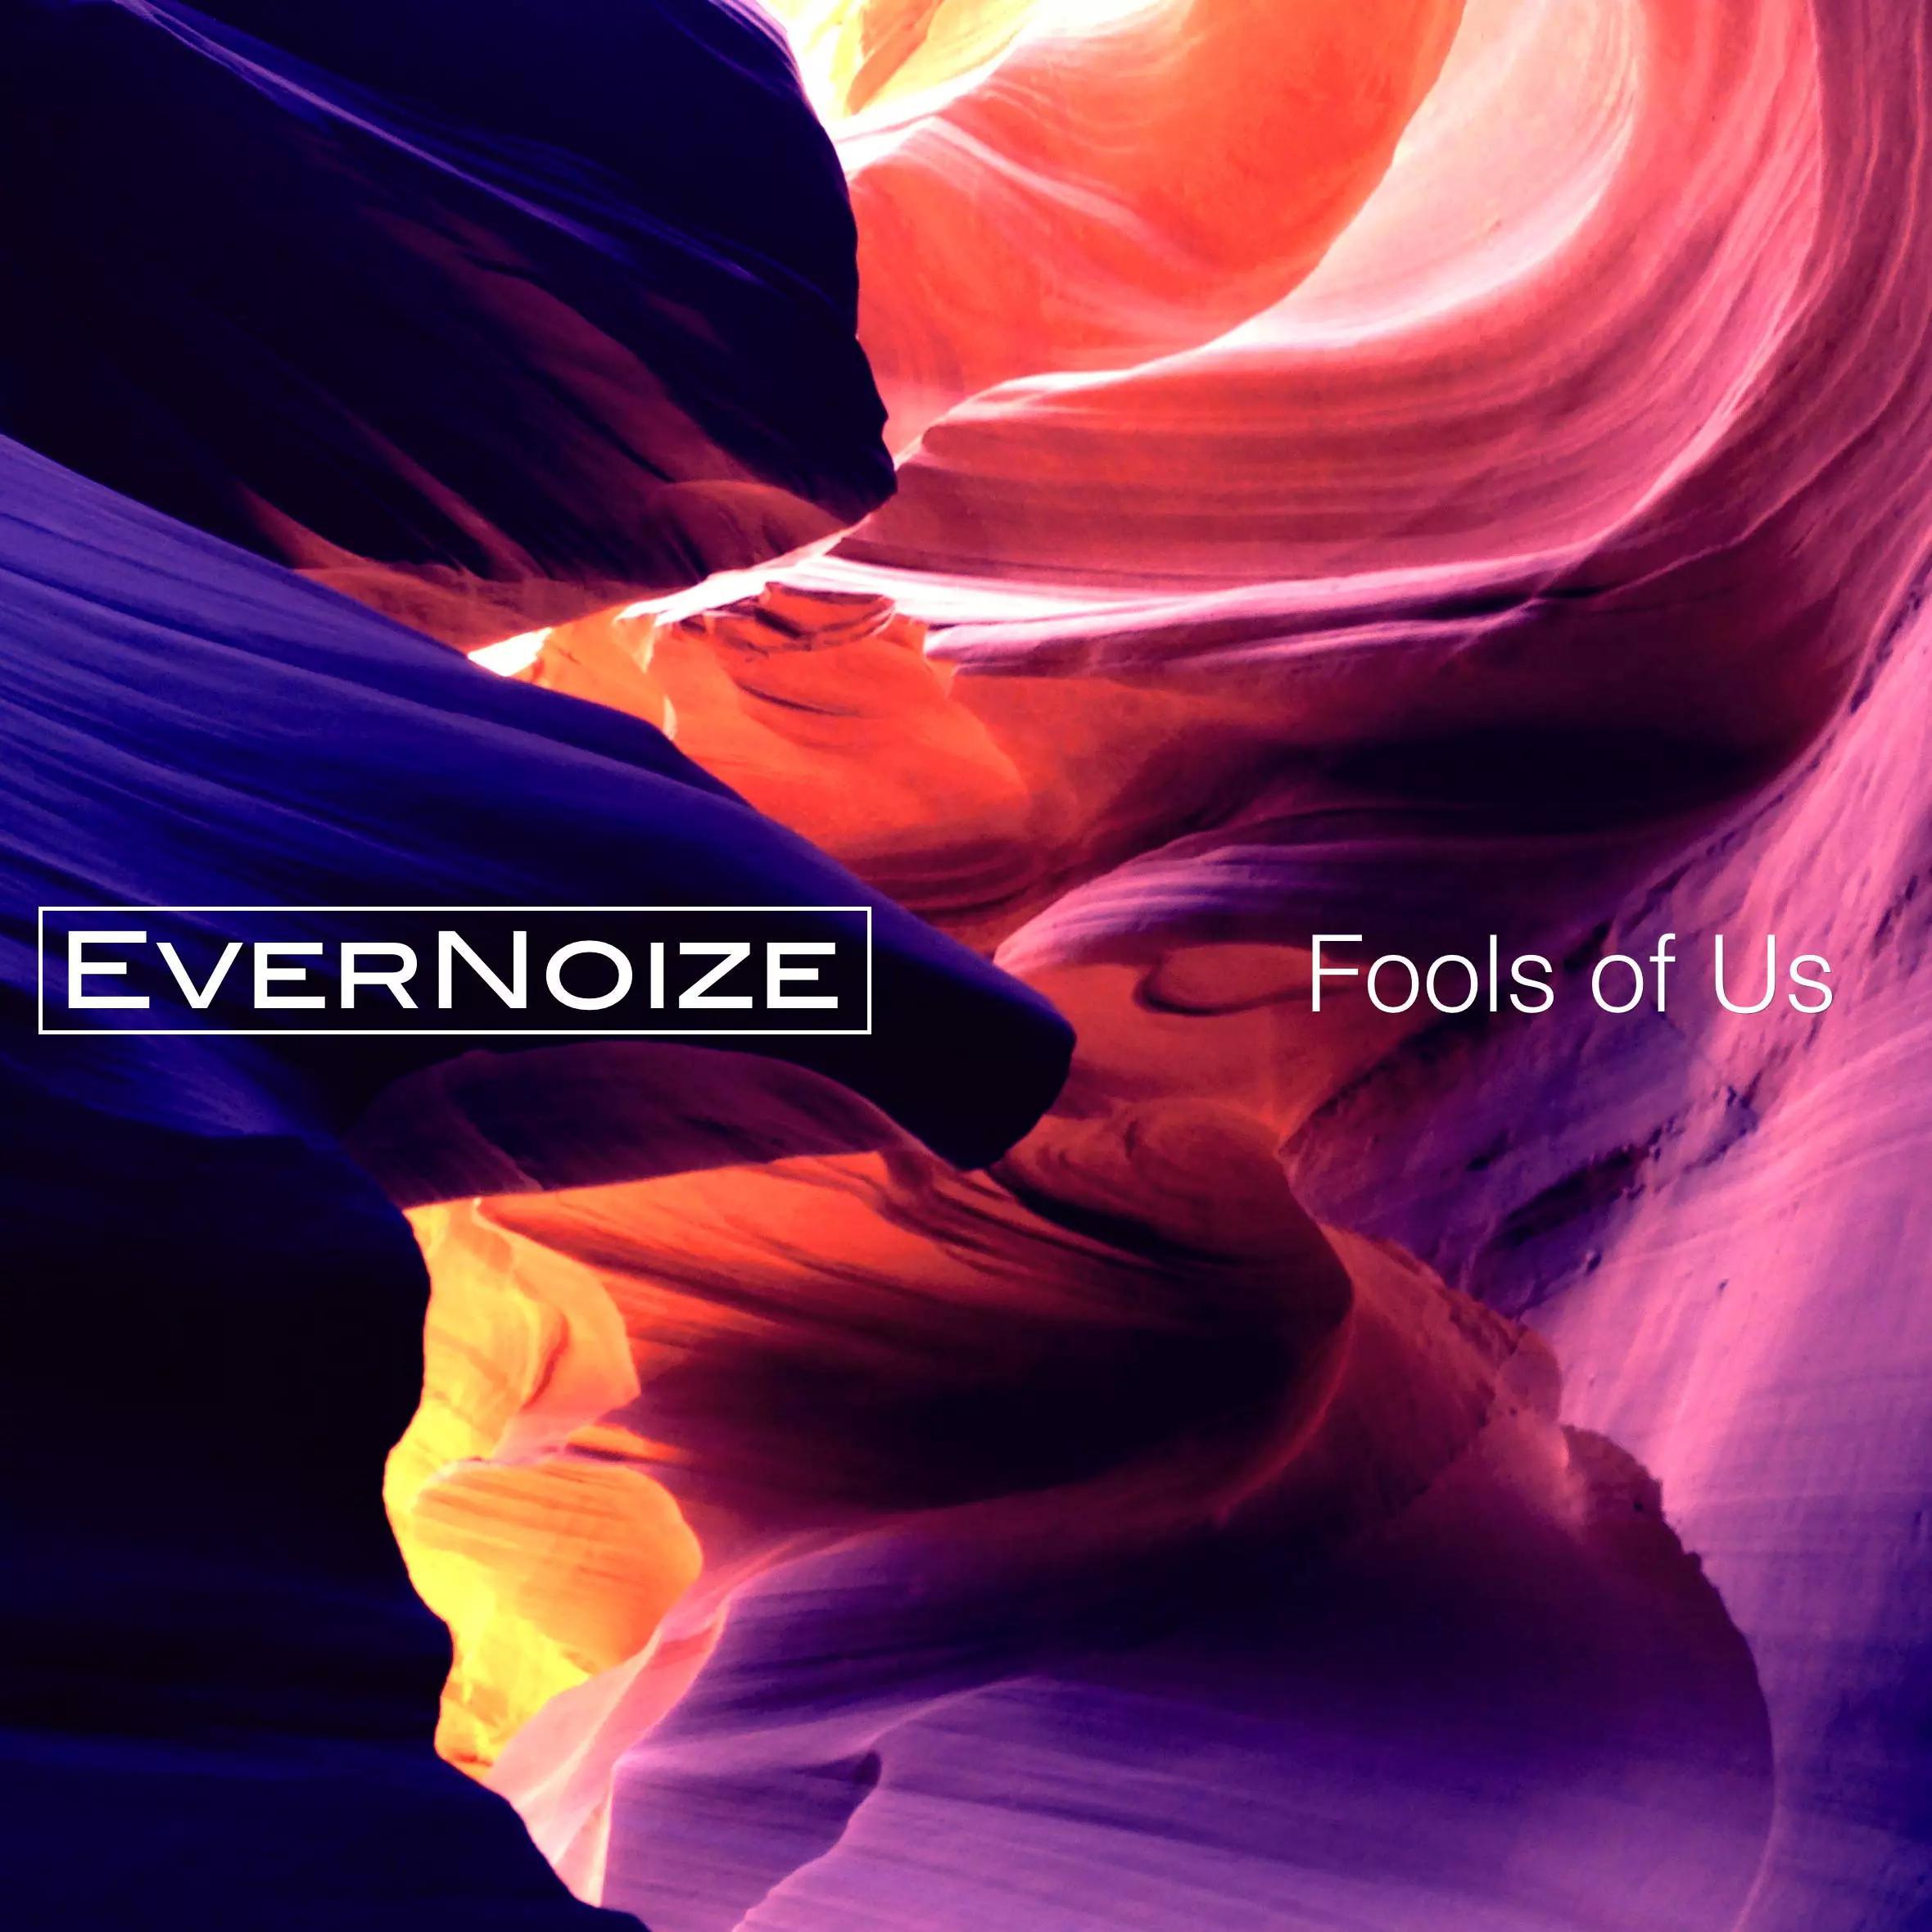 Fools of Us - cover v7